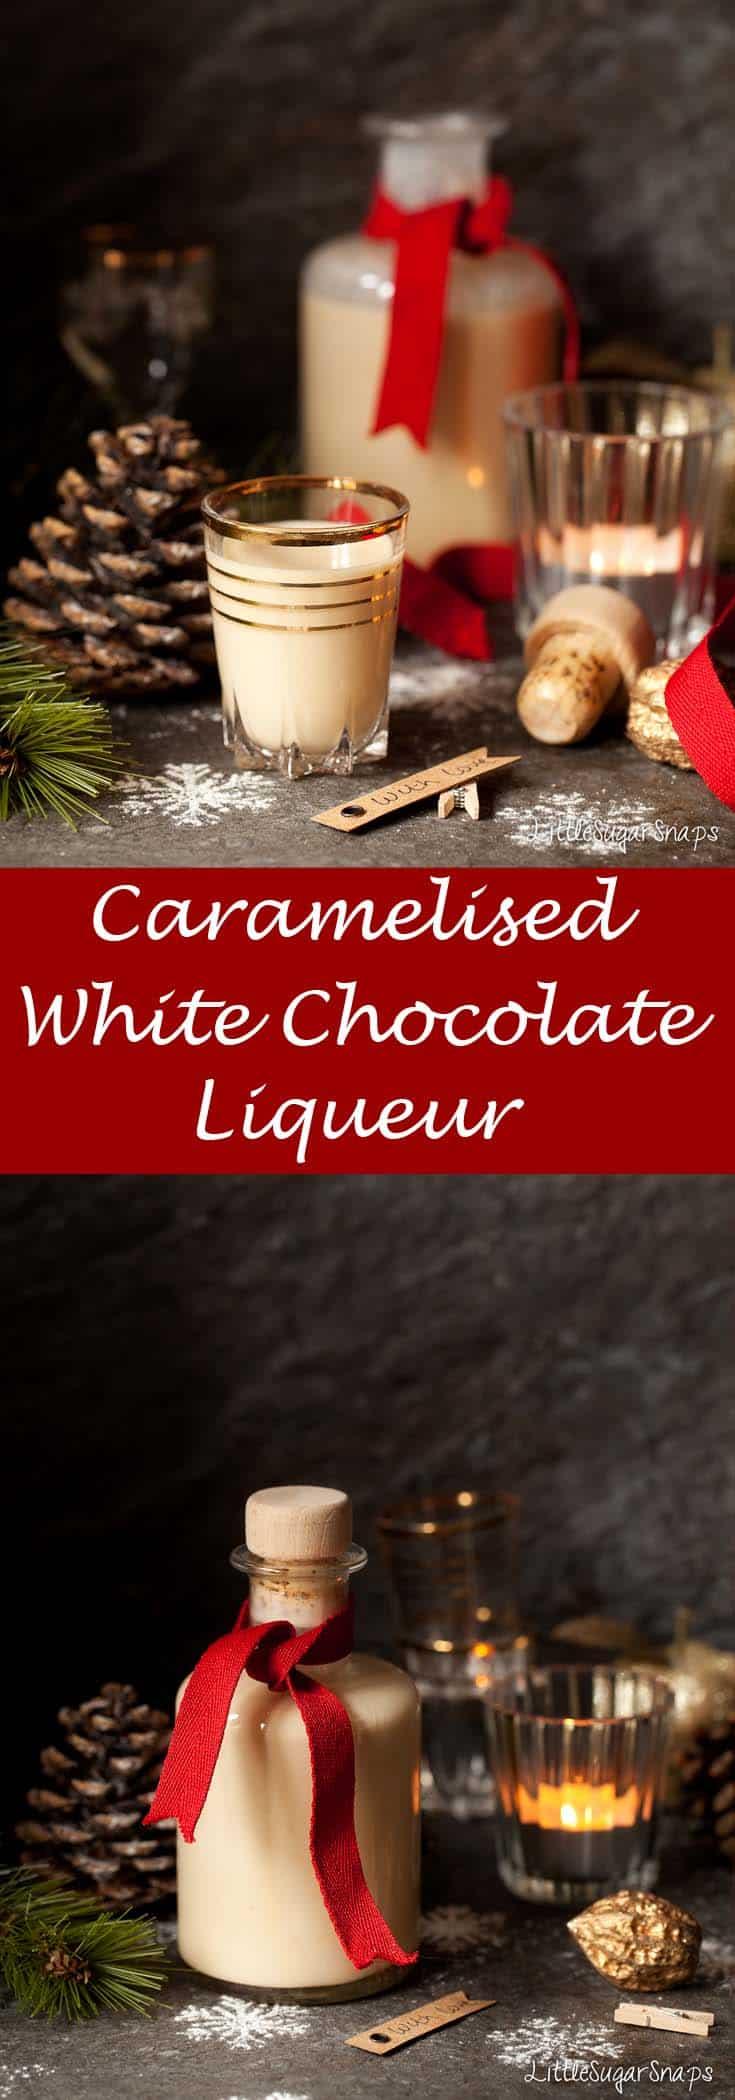 Caramelised White Chocolate Liqueur #ChocolateLiqueur #CaramelisedWhiteChocolate #CaramelizedWhiteChocolate #WhiteChocolateLiqueur